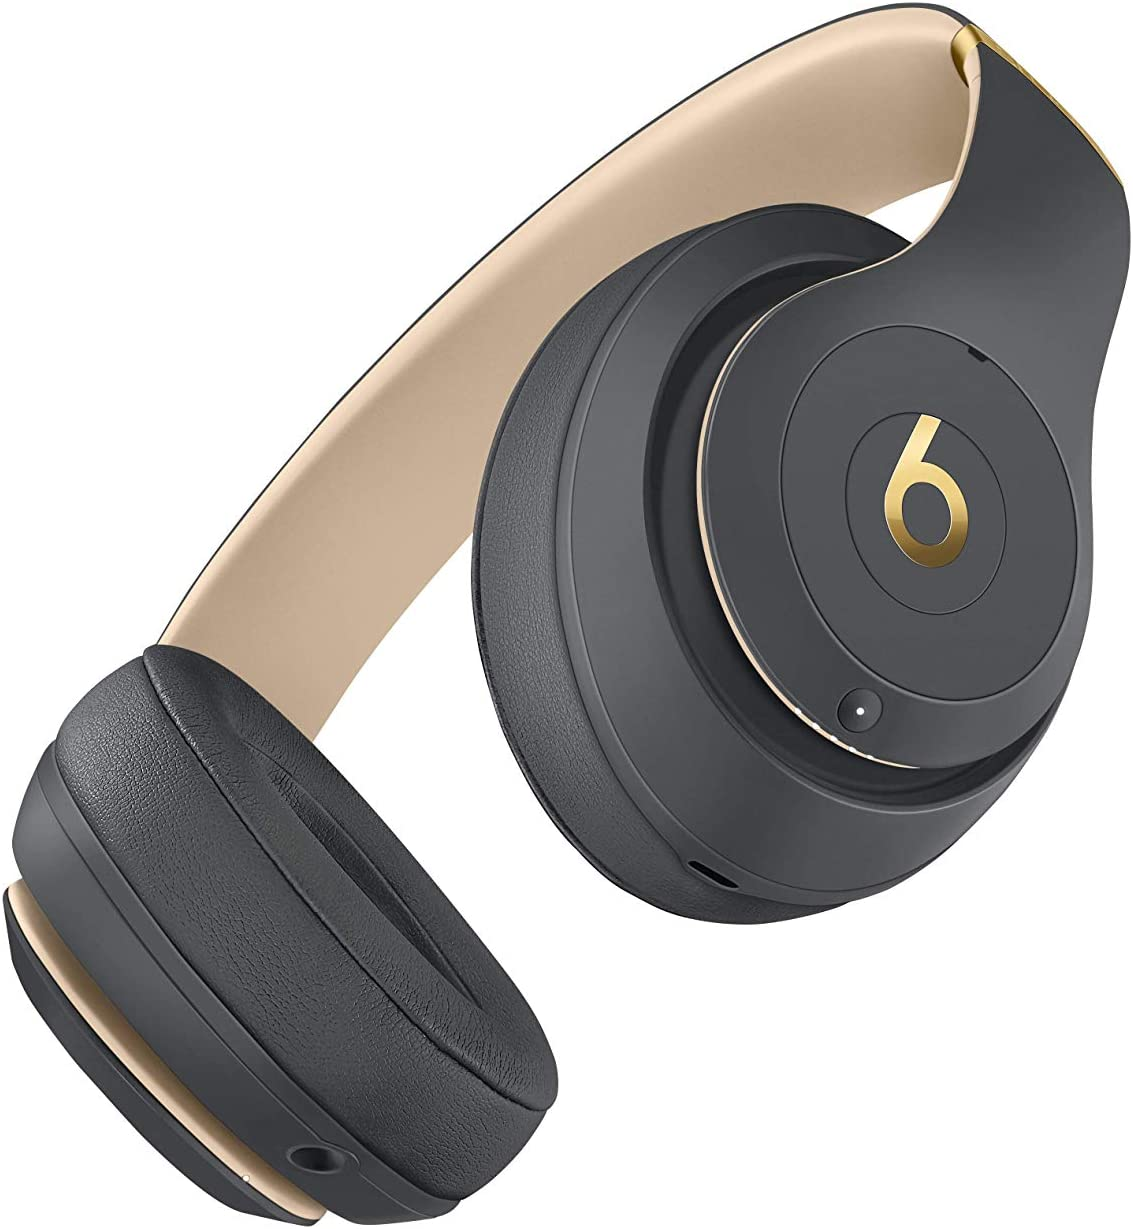 Beats Studio3 Wireless ワイヤレスノイズキャンセリングヘッドホン - シャドーグレー